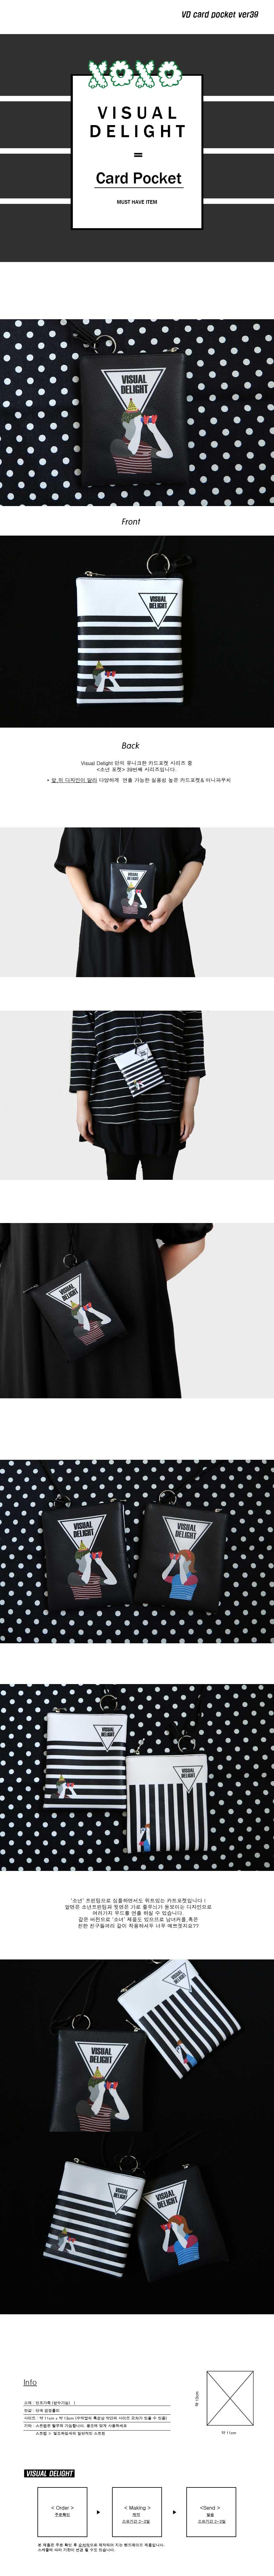 Boy card pocket16,000원-비주얼 딜라이트패션잡화, 지갑, 동전/카드지갑, 목걸이형카드지갑바보사랑Boy card pocket16,000원-비주얼 딜라이트패션잡화, 지갑, 동전/카드지갑, 목걸이형카드지갑바보사랑